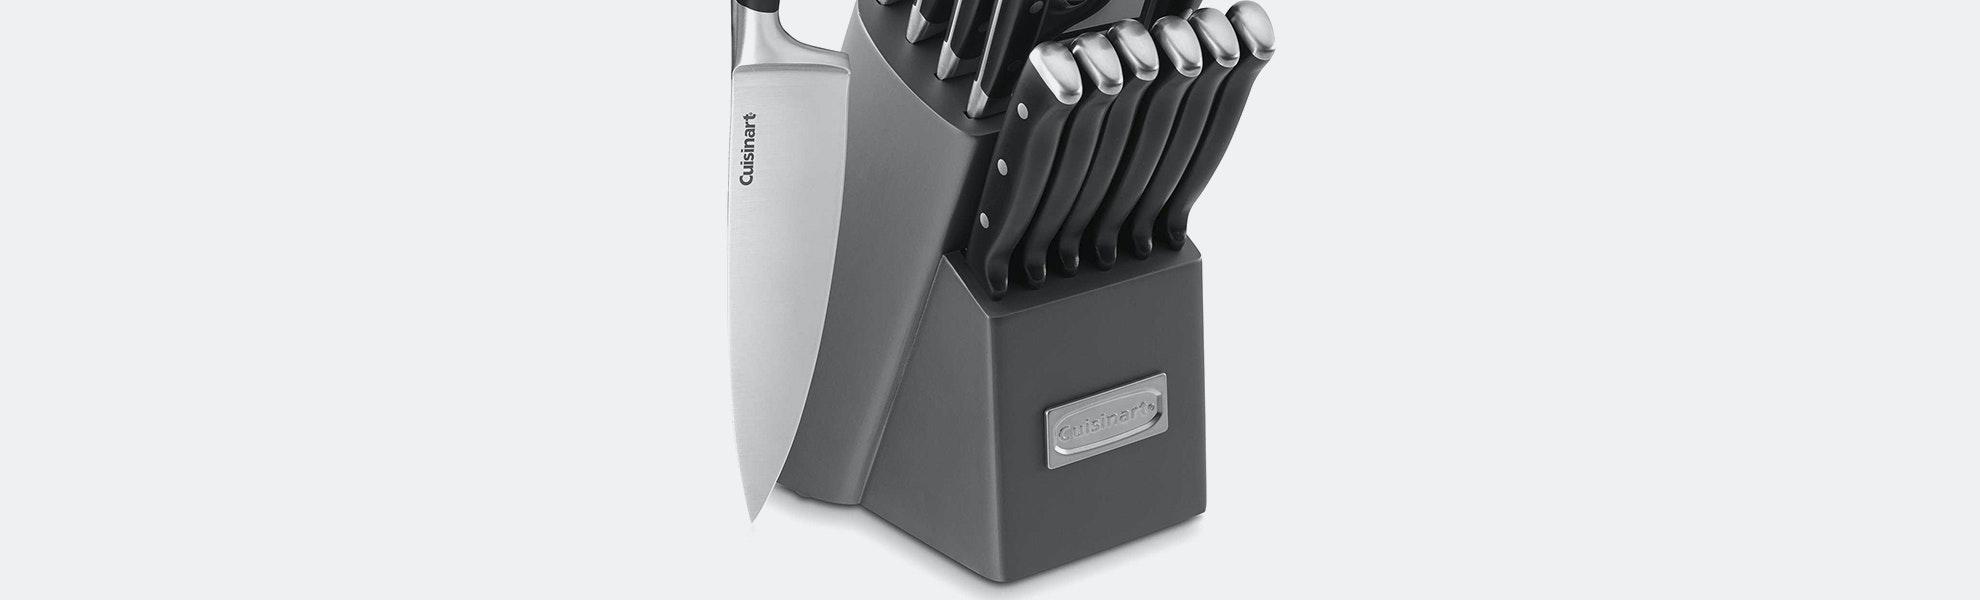 Cuisinart Classic Triple-Rivet 15-Piece Knife Set